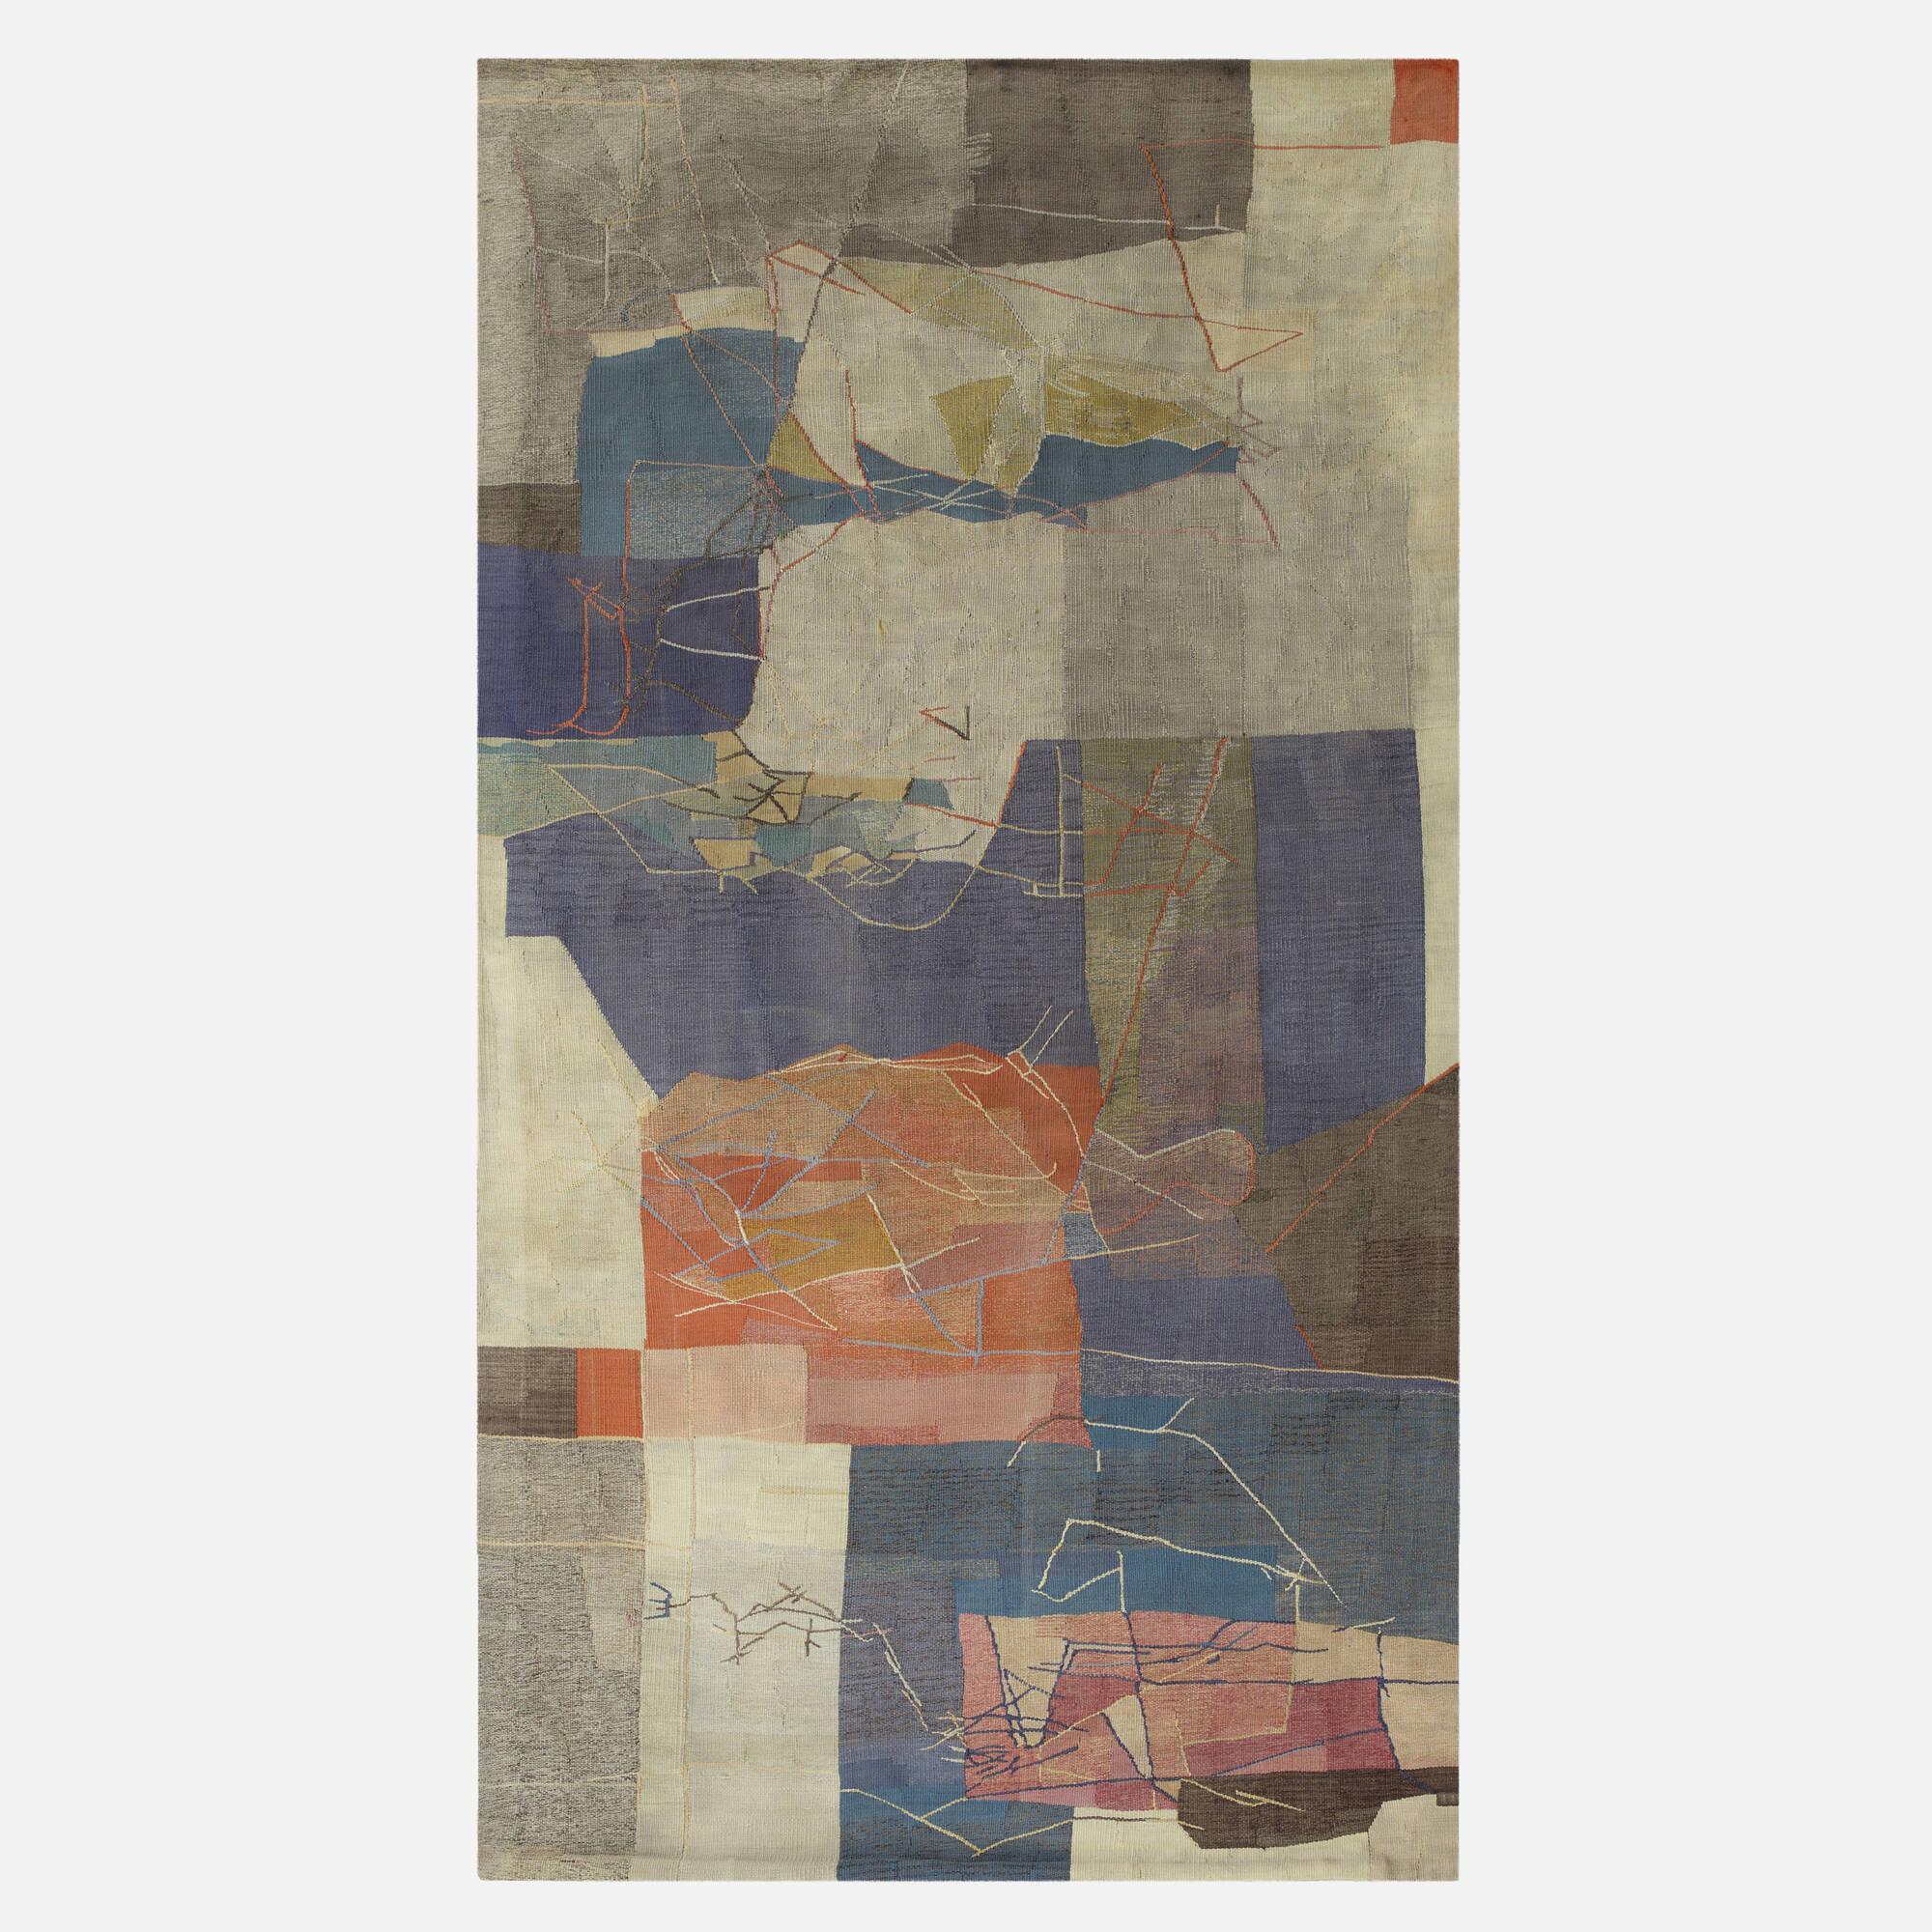 718: Johanna Schidlo / tapestry (1 of 1)